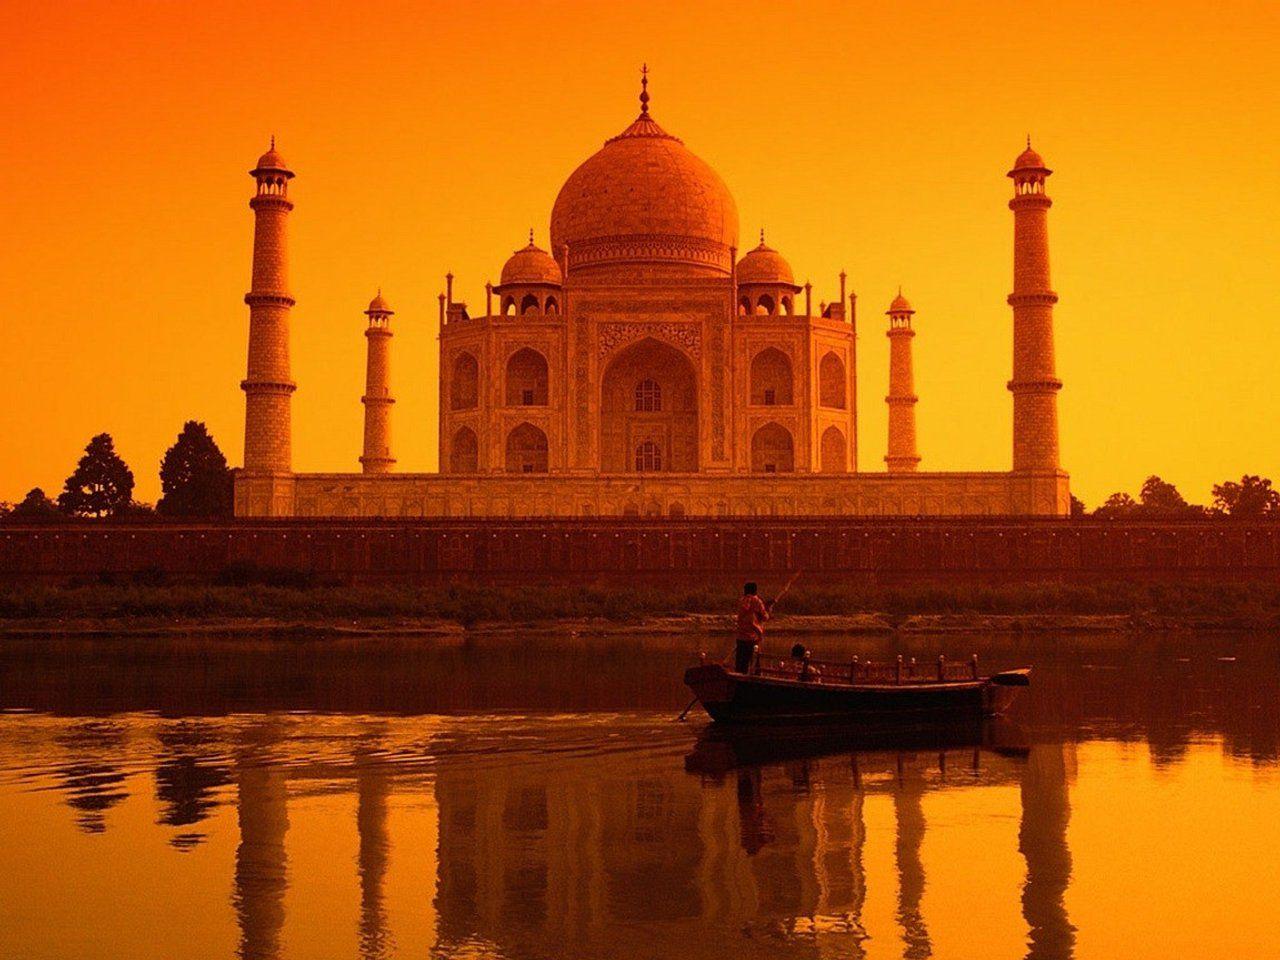 Amanecer Porn Family explore majestic india | taj mahal india, beautiful places